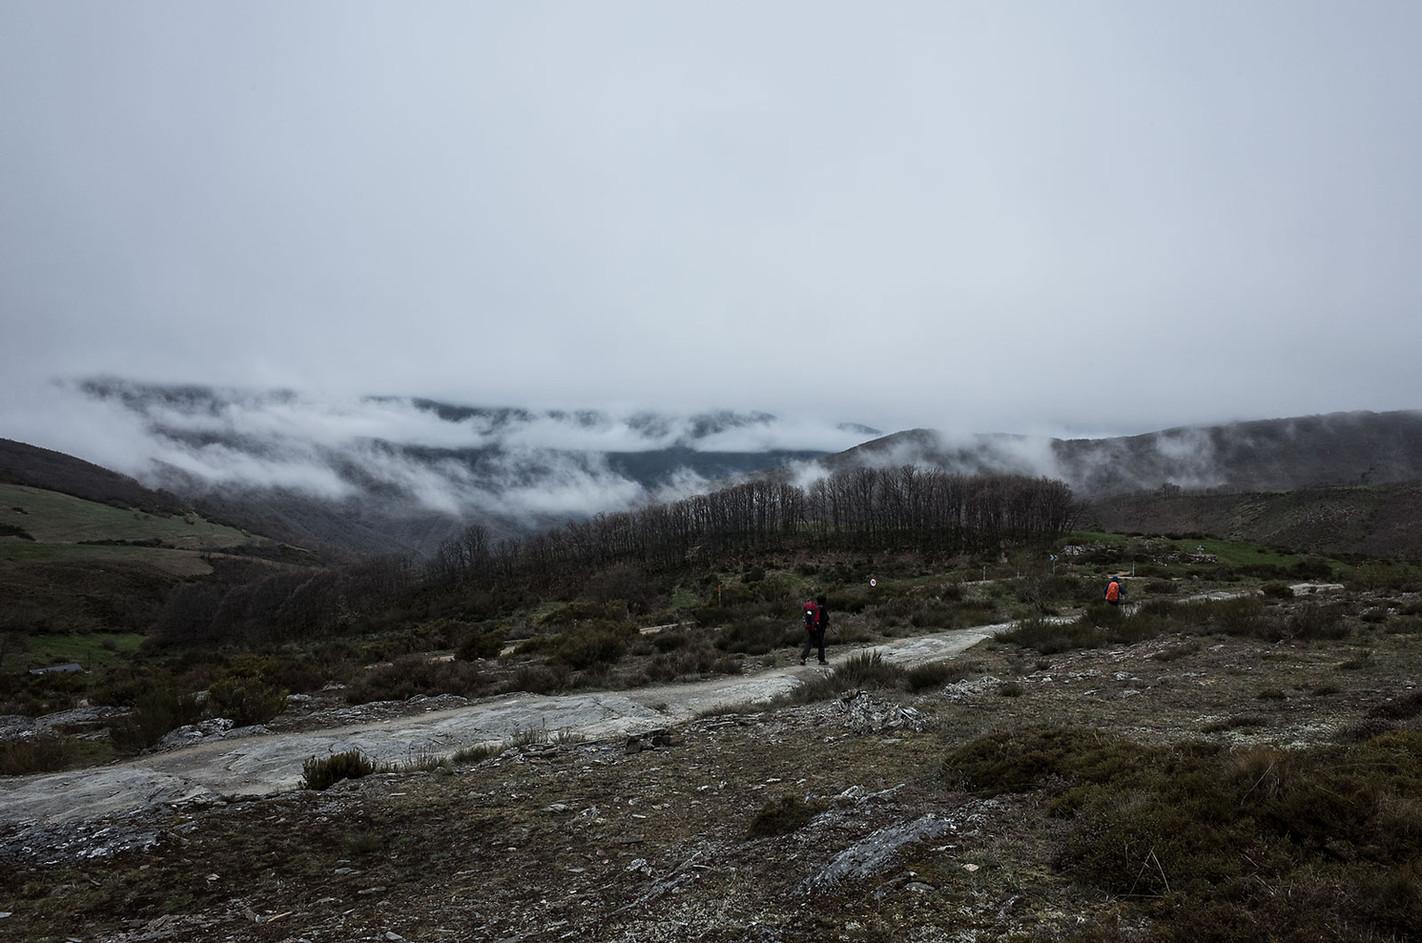 Low clouds separate the mountain ridges near Manjarín.